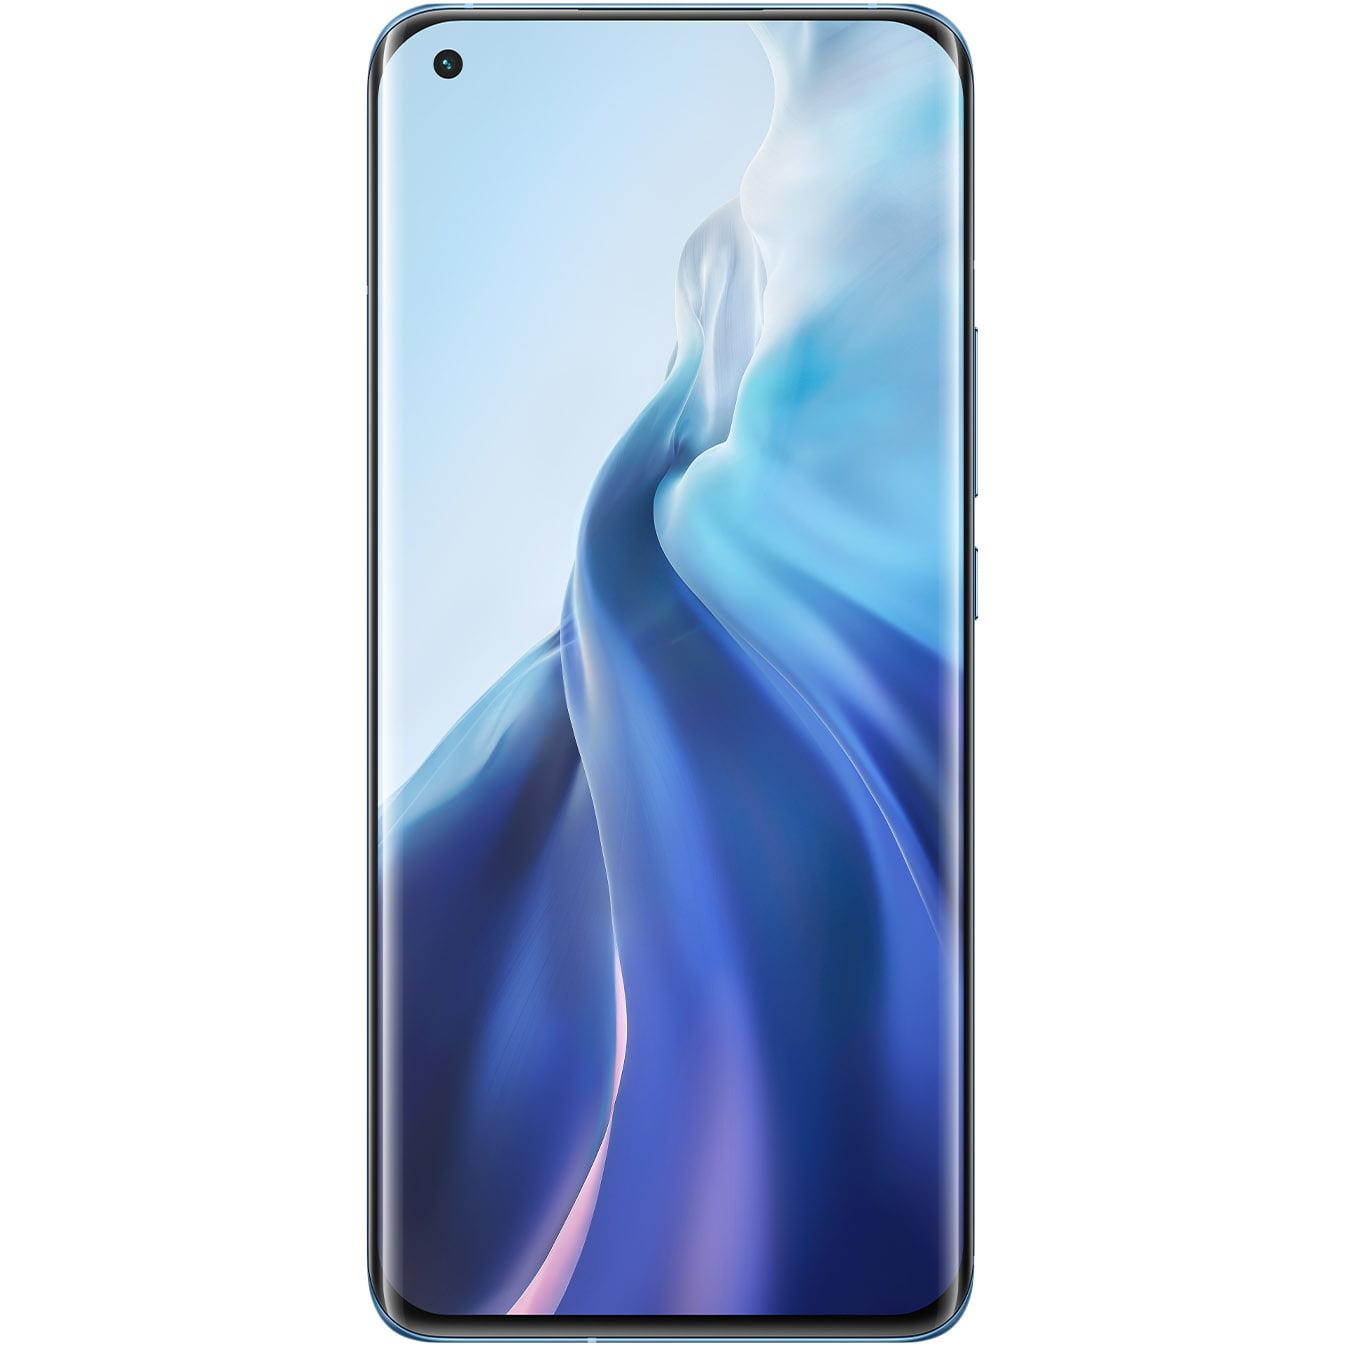 Telefon mobil Xiaomi Mi 11, Dual SIM, 256GB, 8GB RAM, 5G, Horizon Blue